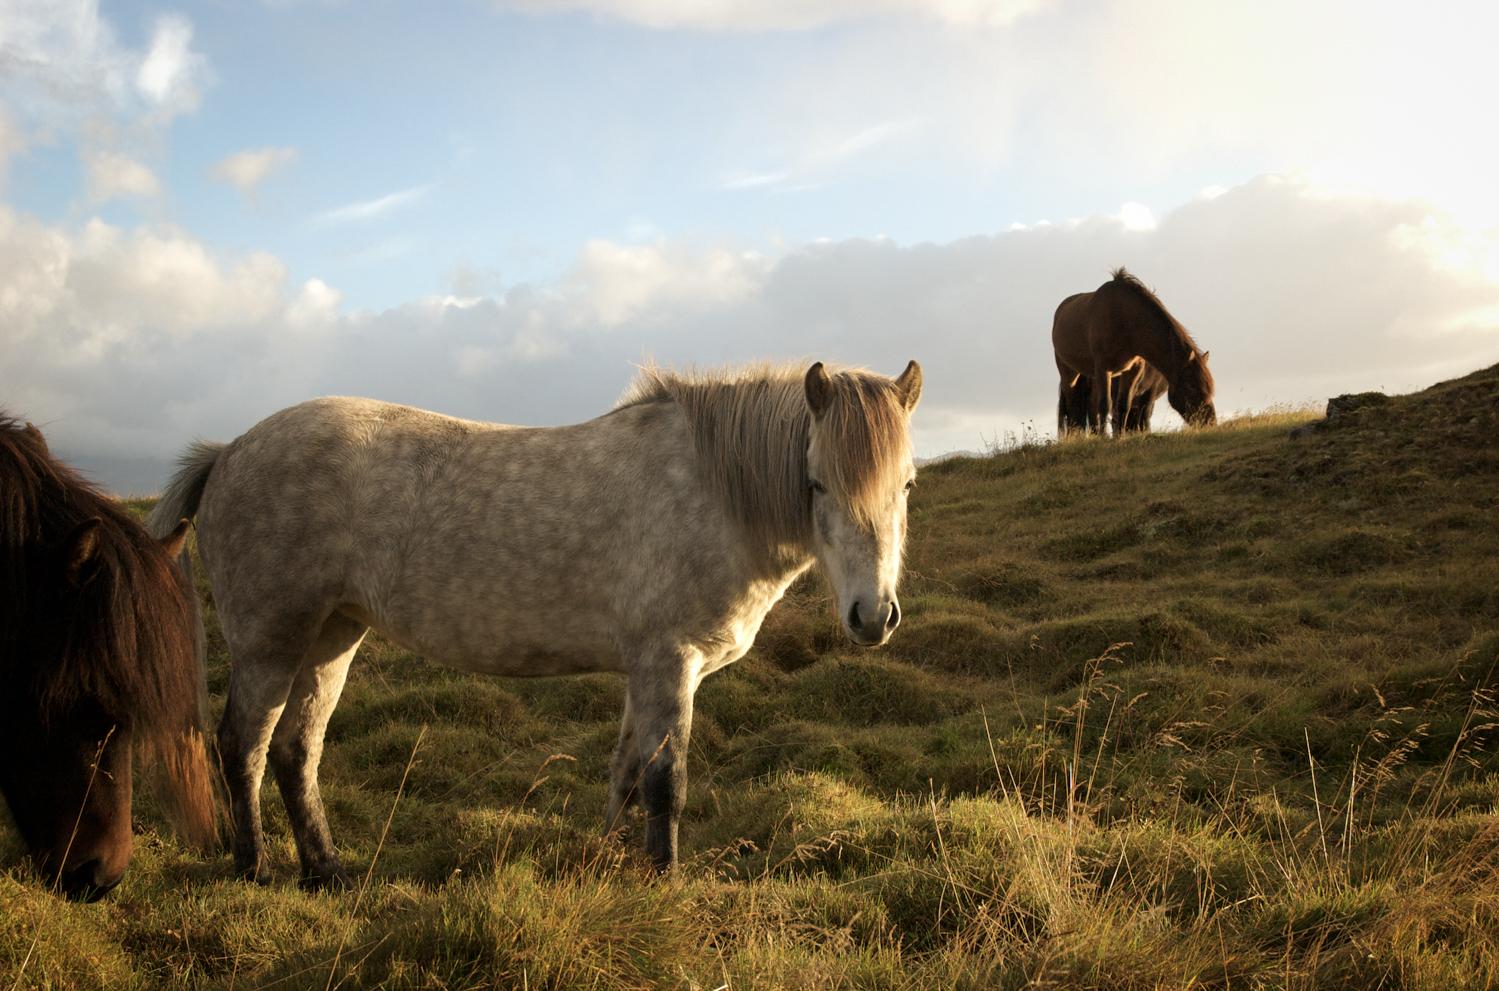 luzod-design-co-mae-iceland-horse-golden-hour.jpg